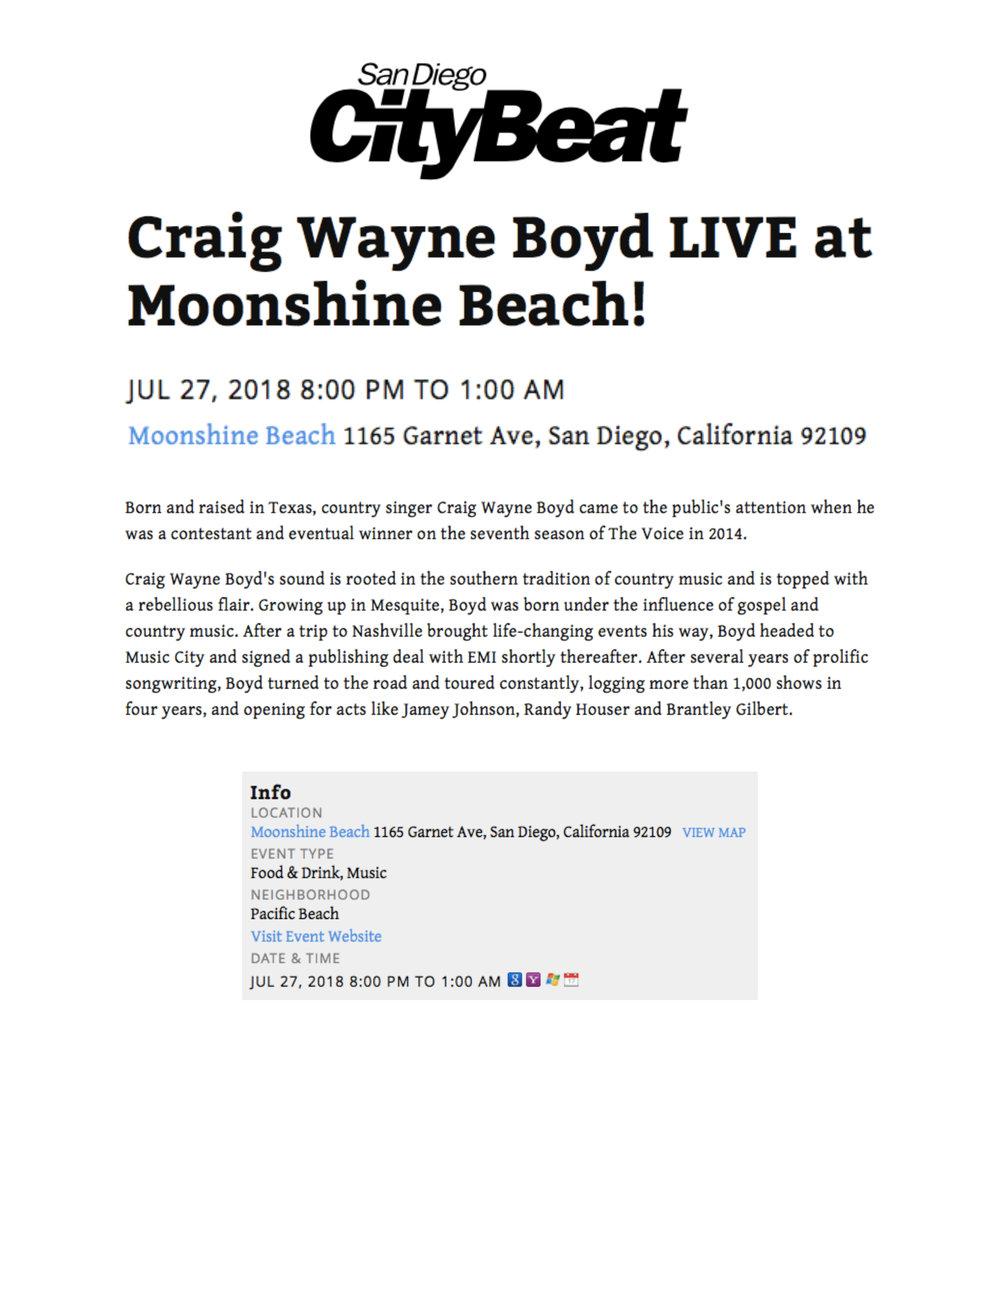 MB_SDCityBeat_CraigWayne_7.17.18.jpg